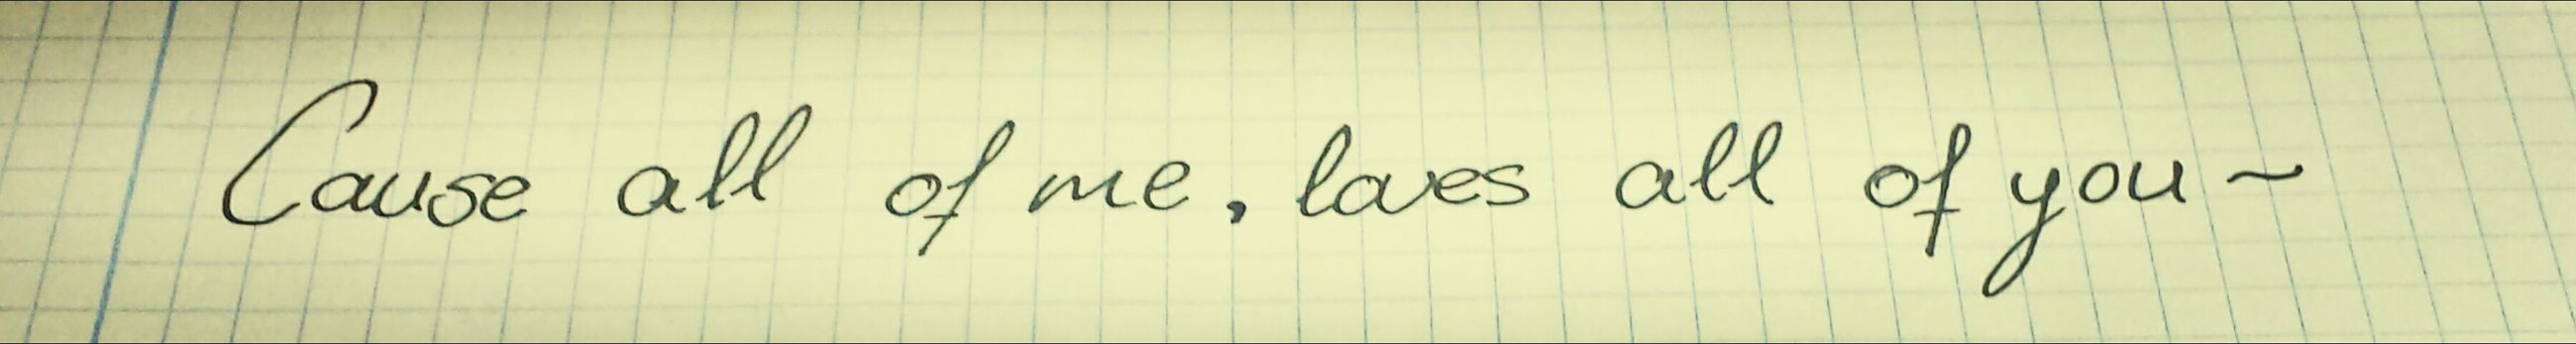 Love John Legend Music Lyrics